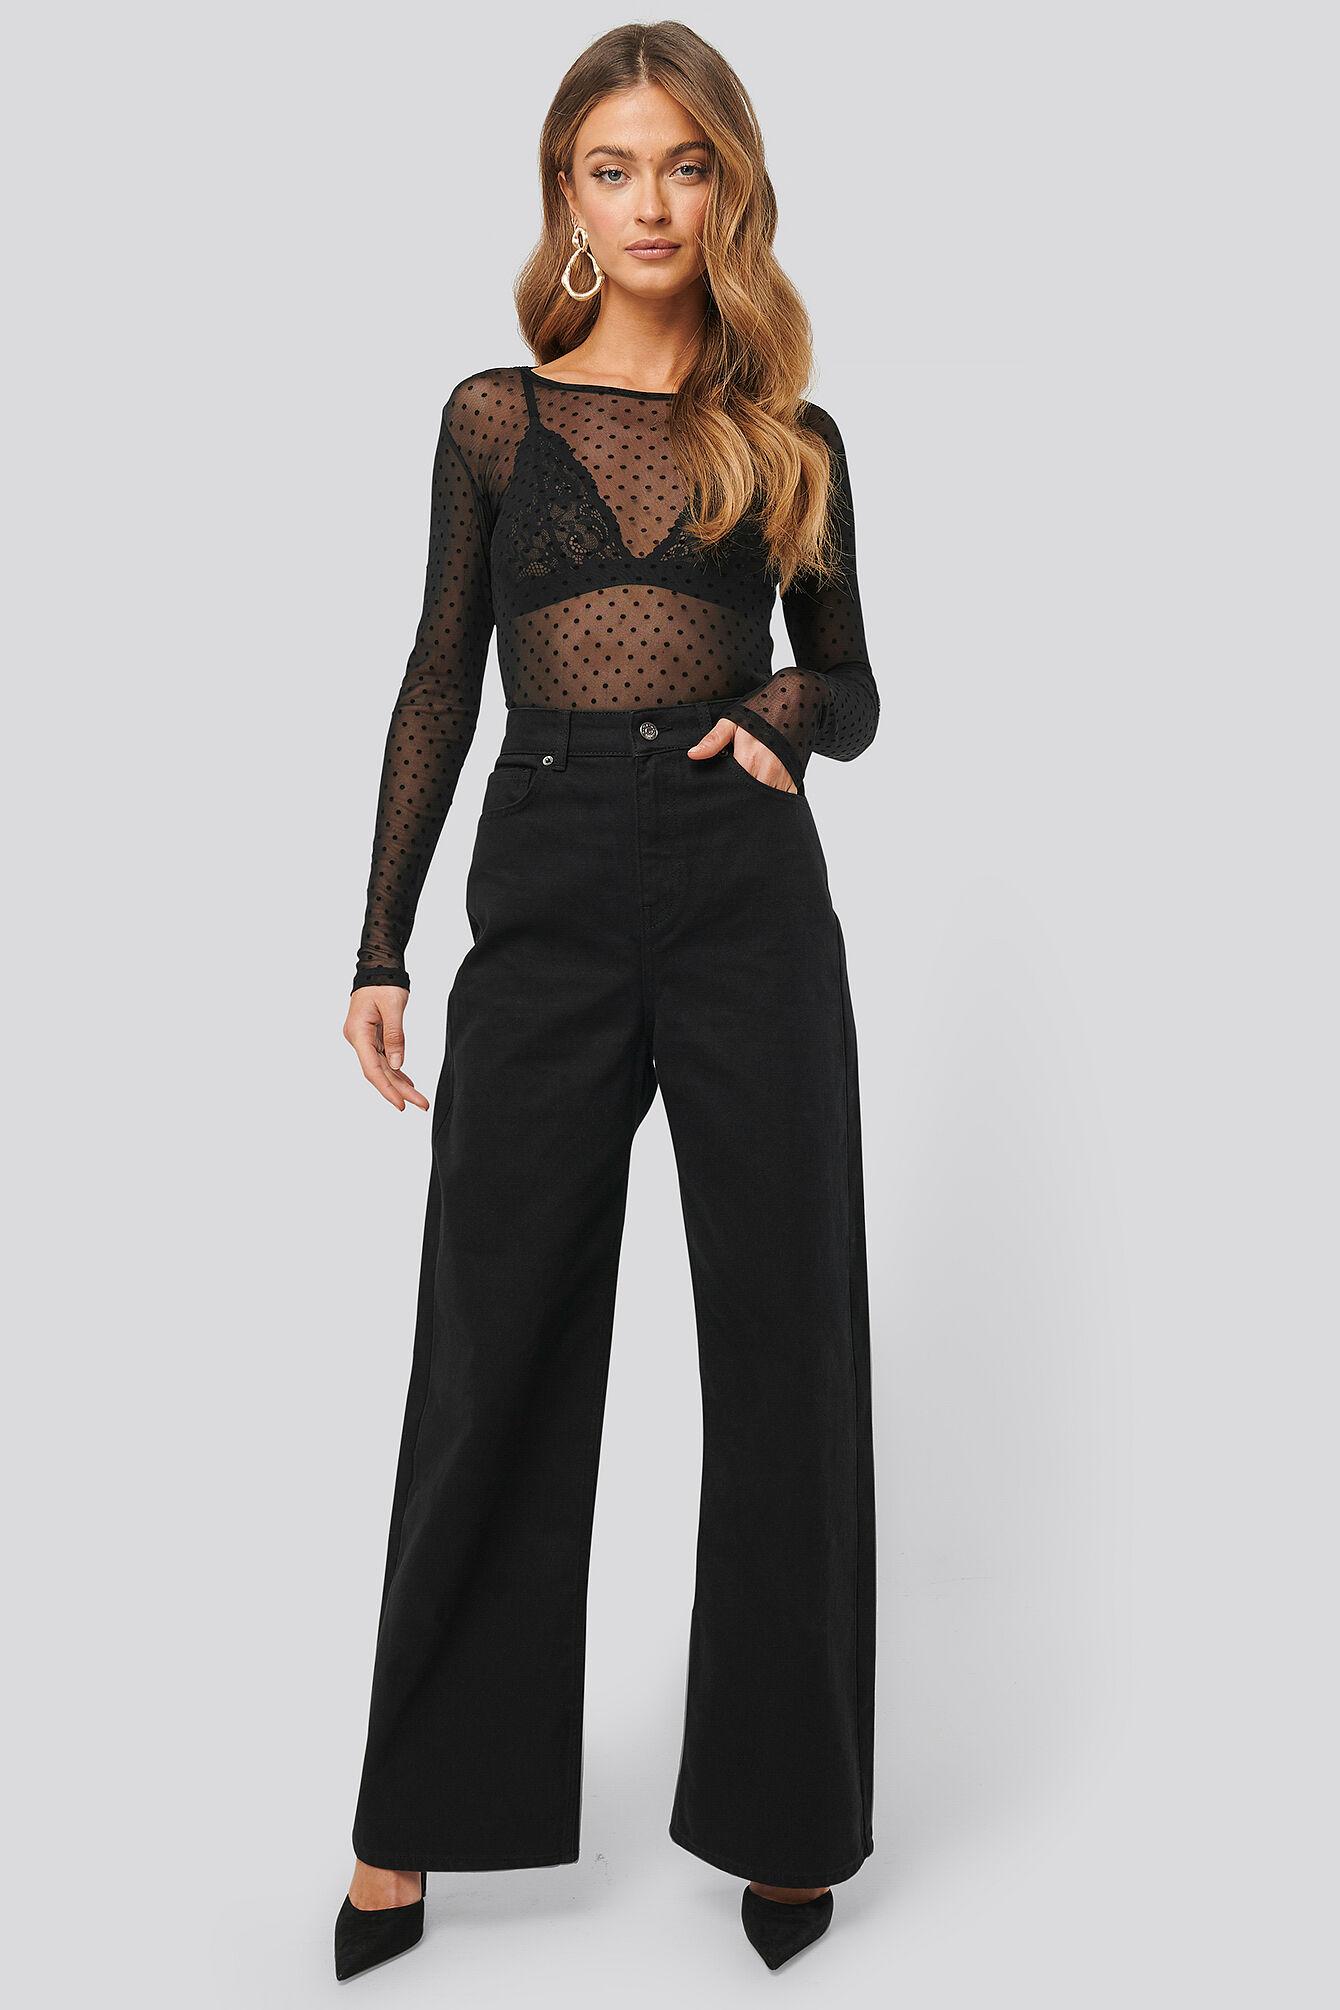 NA-KD Trend Wide Leg High Waisted Jeans - Black